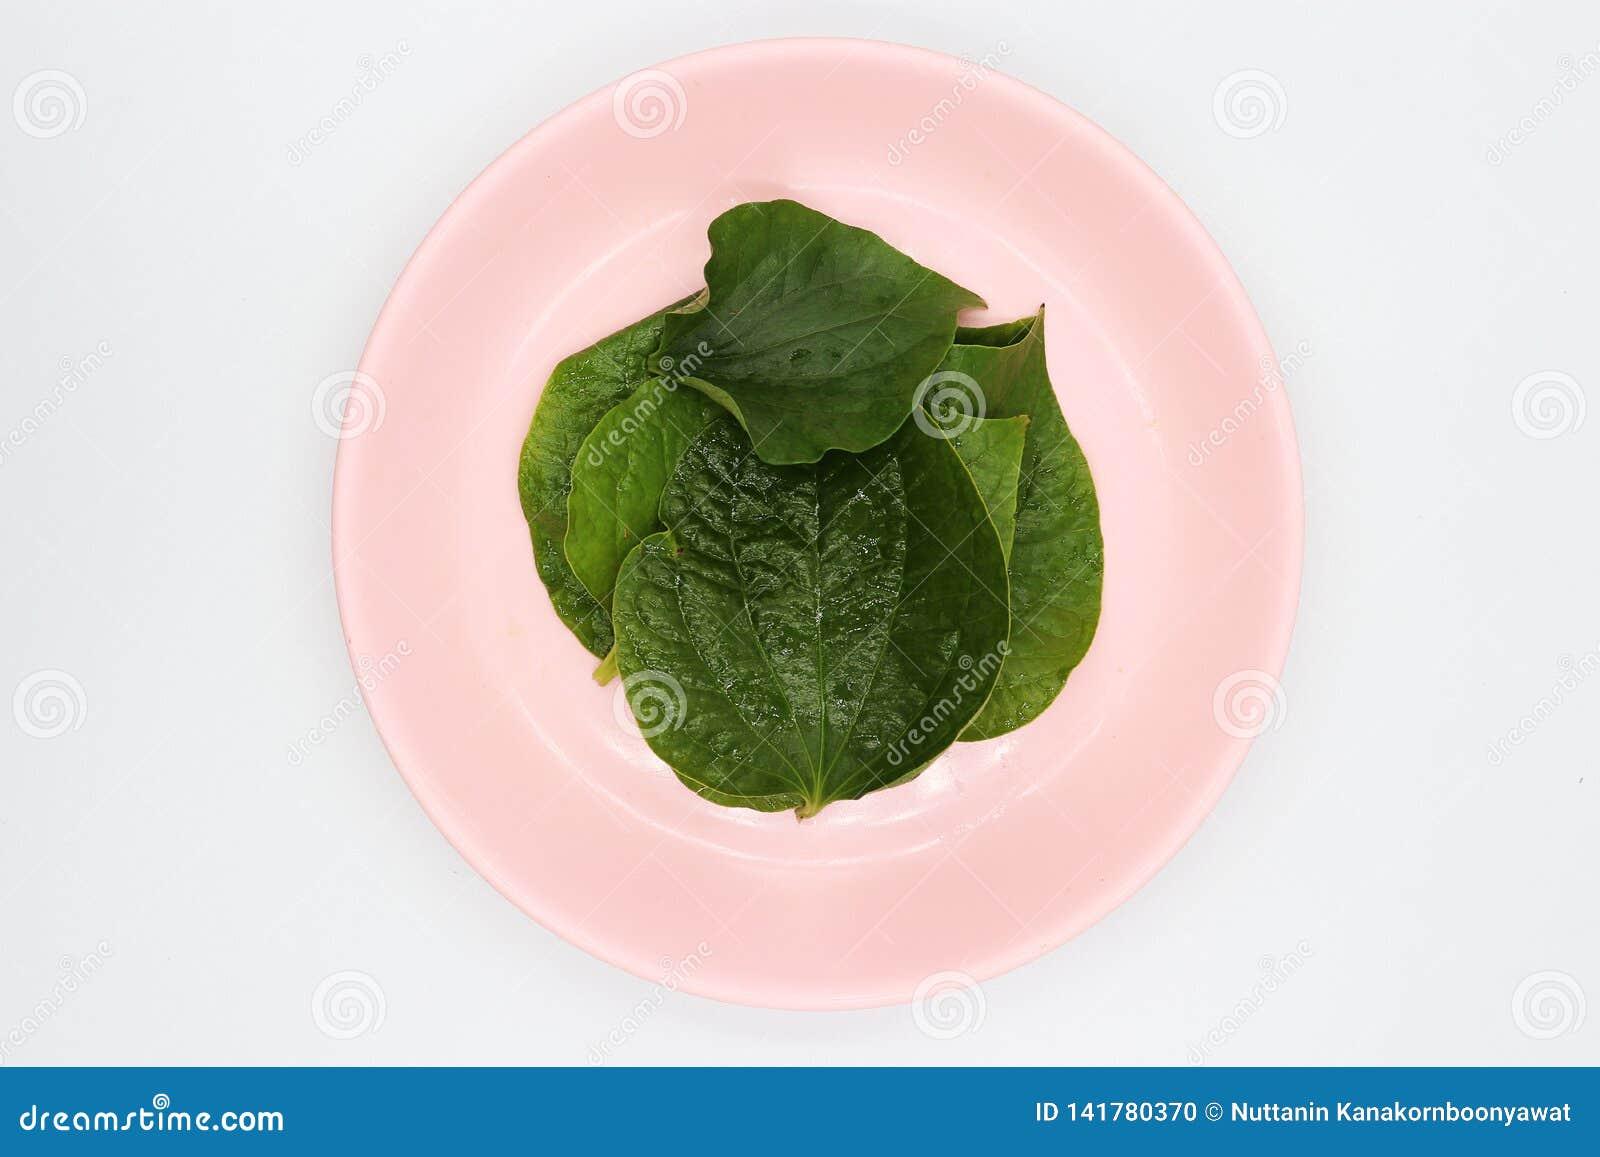 Chaplo sae no prato cor-de-rosa no fundo branco